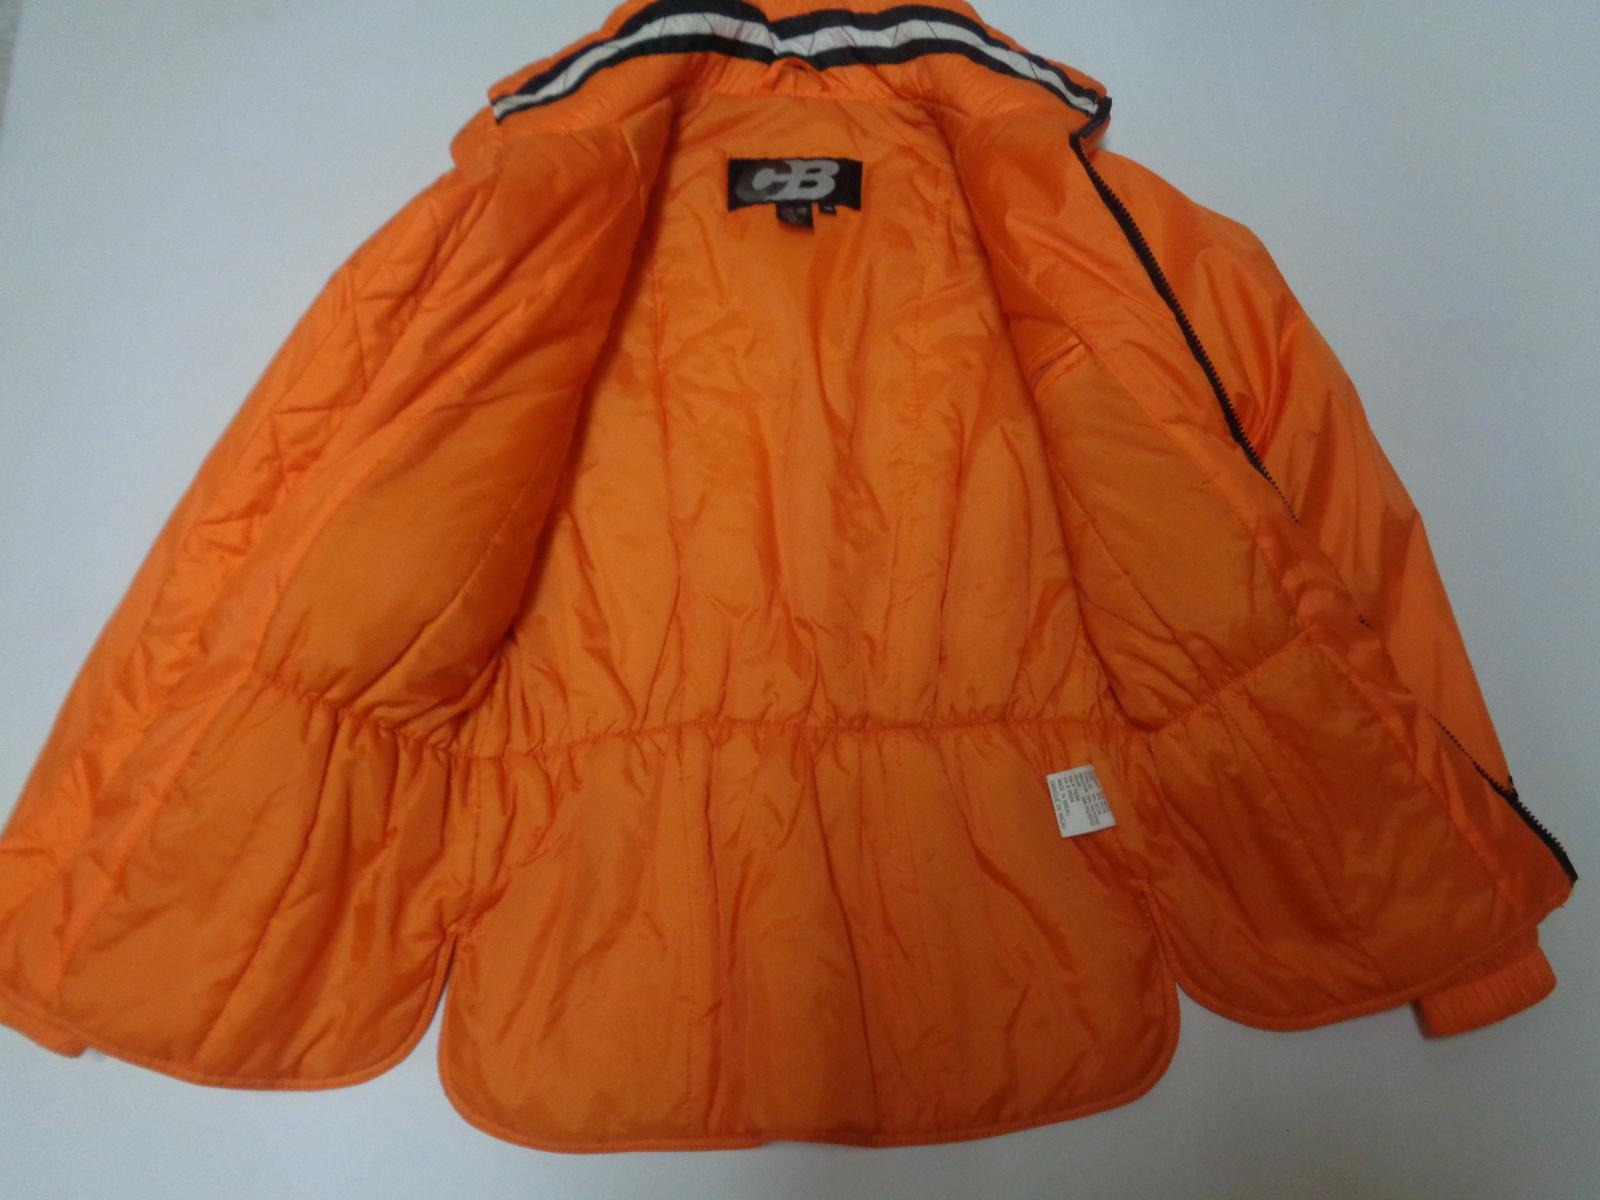 Ladies' Orange Ski Snowboarding Jacket Sz 10 CB Sports Down